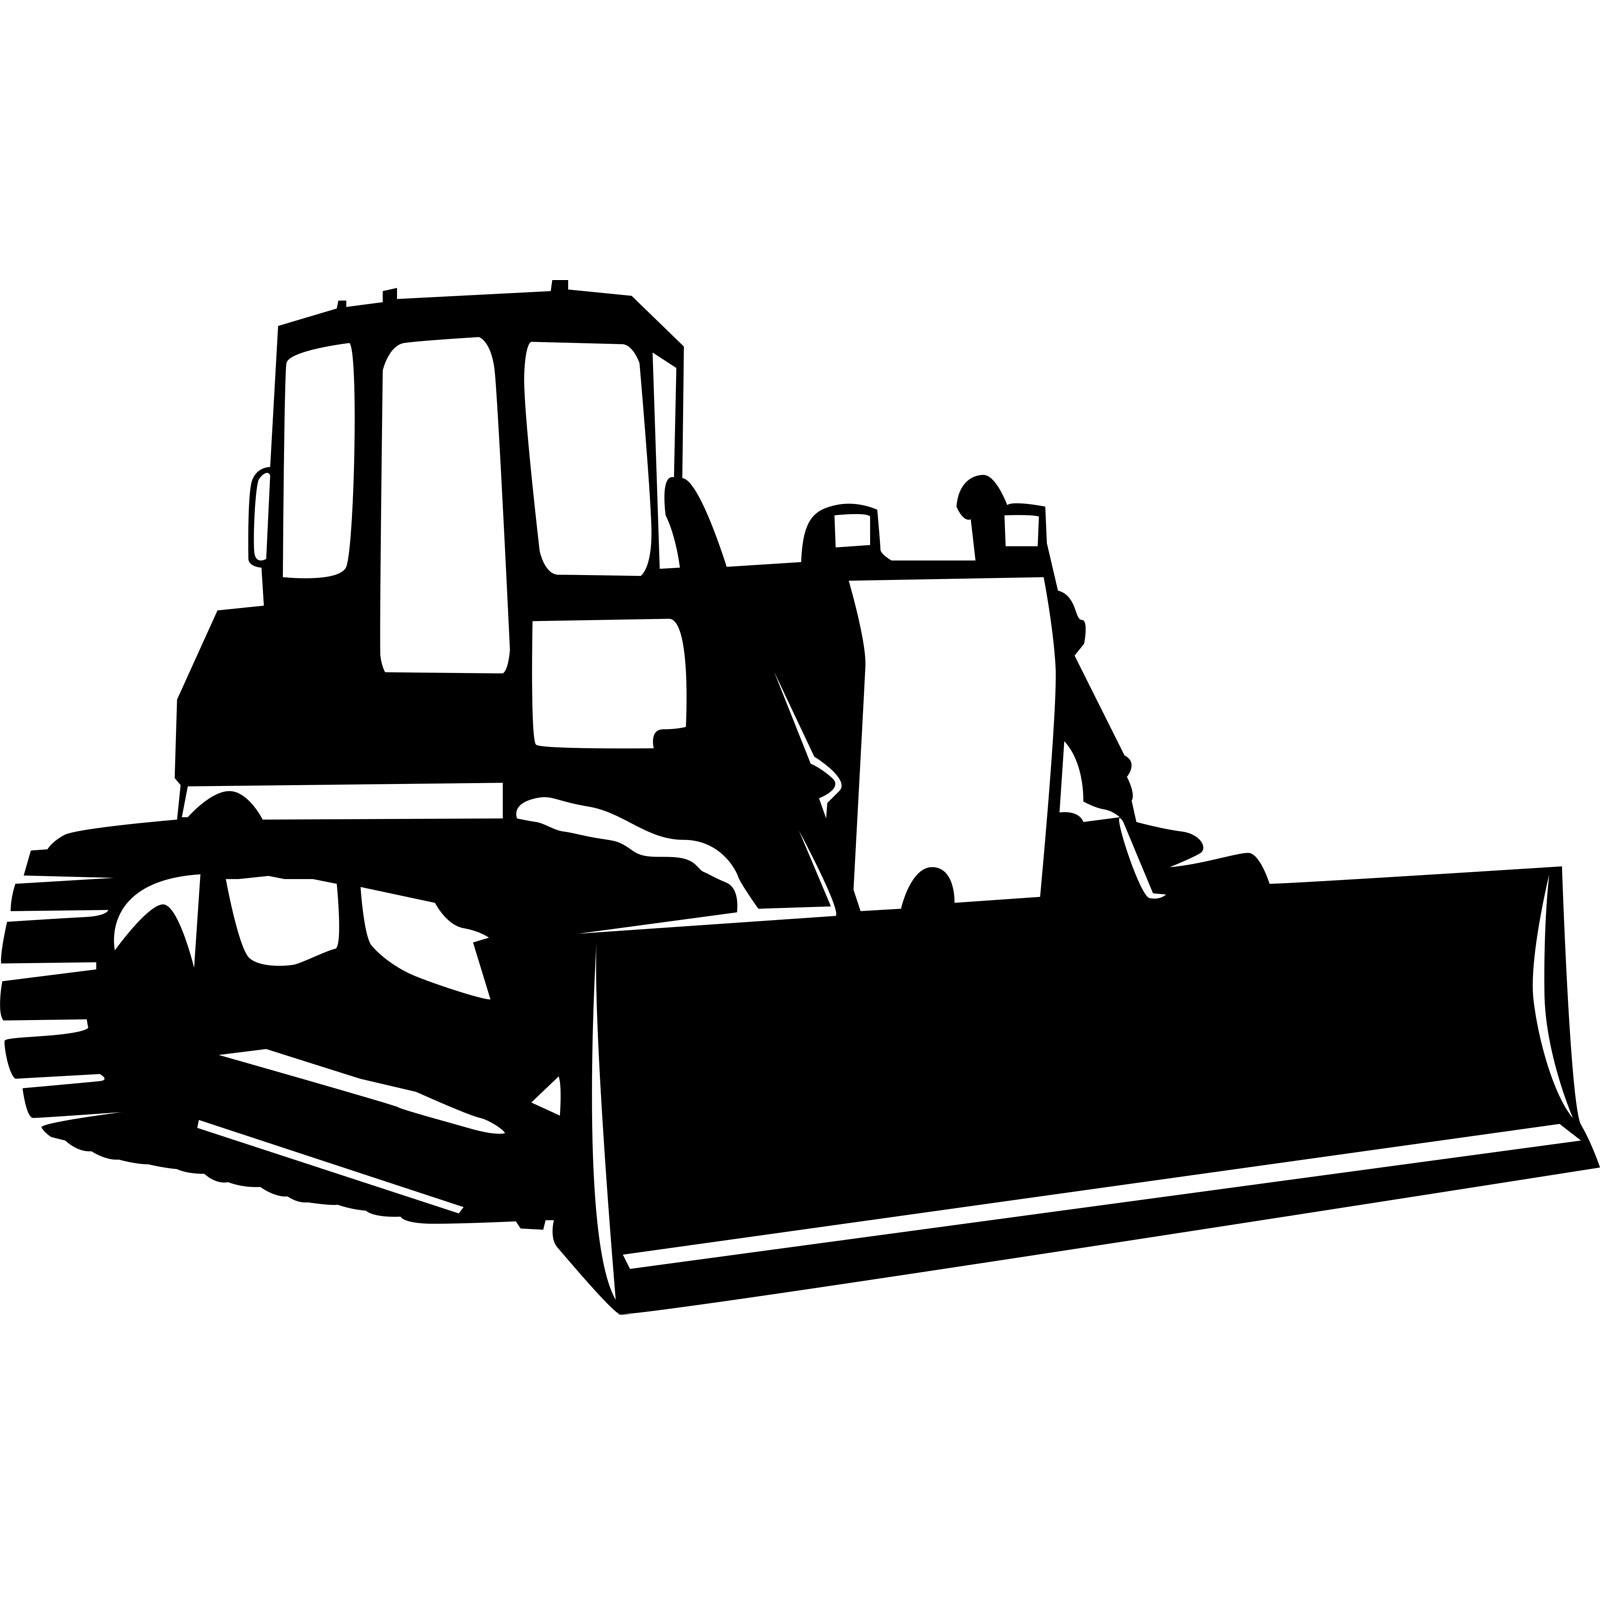 Black clipart bulldozer, Black bulldozer Transparent FREE.